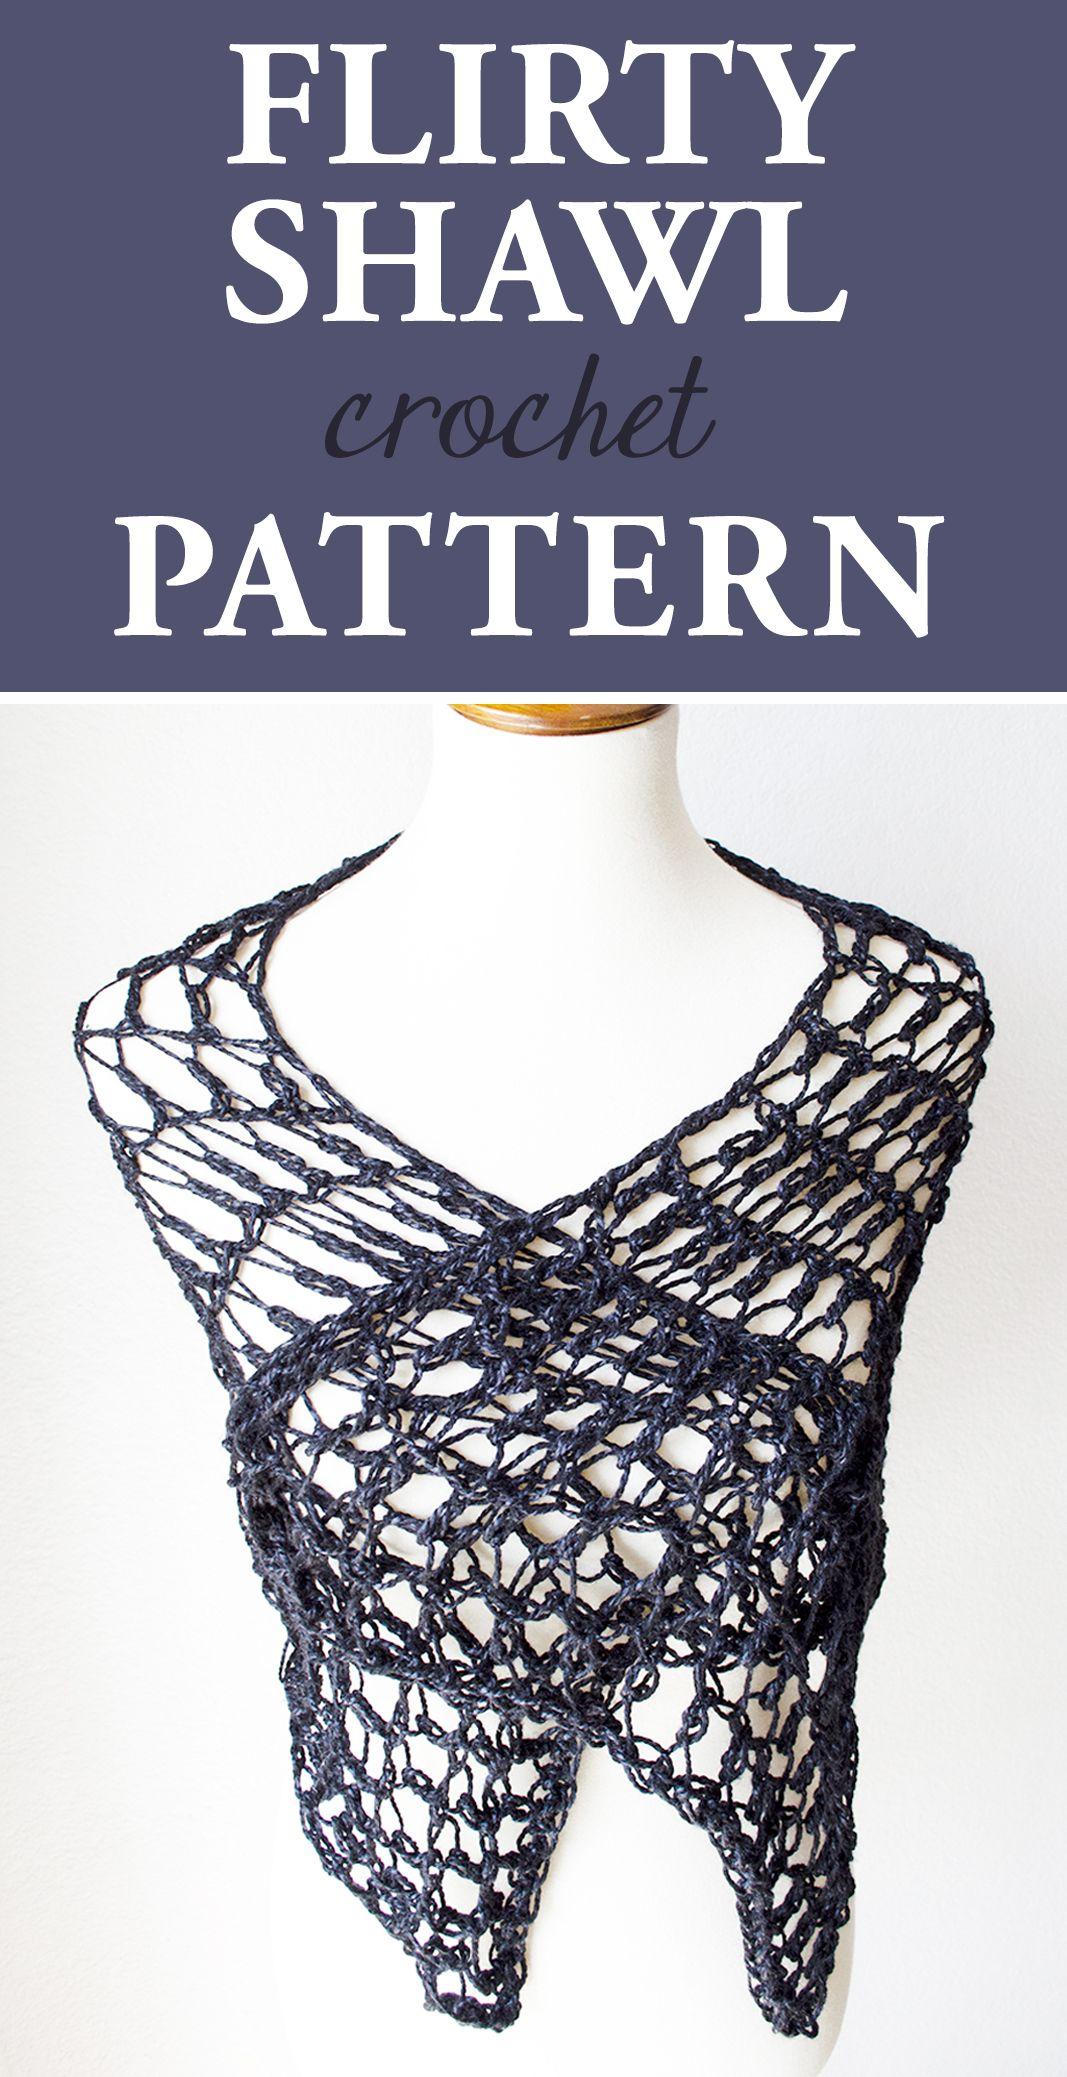 Flirty Shawl Crochet Pattern • Simply Collectible | CROCHET 2 ...